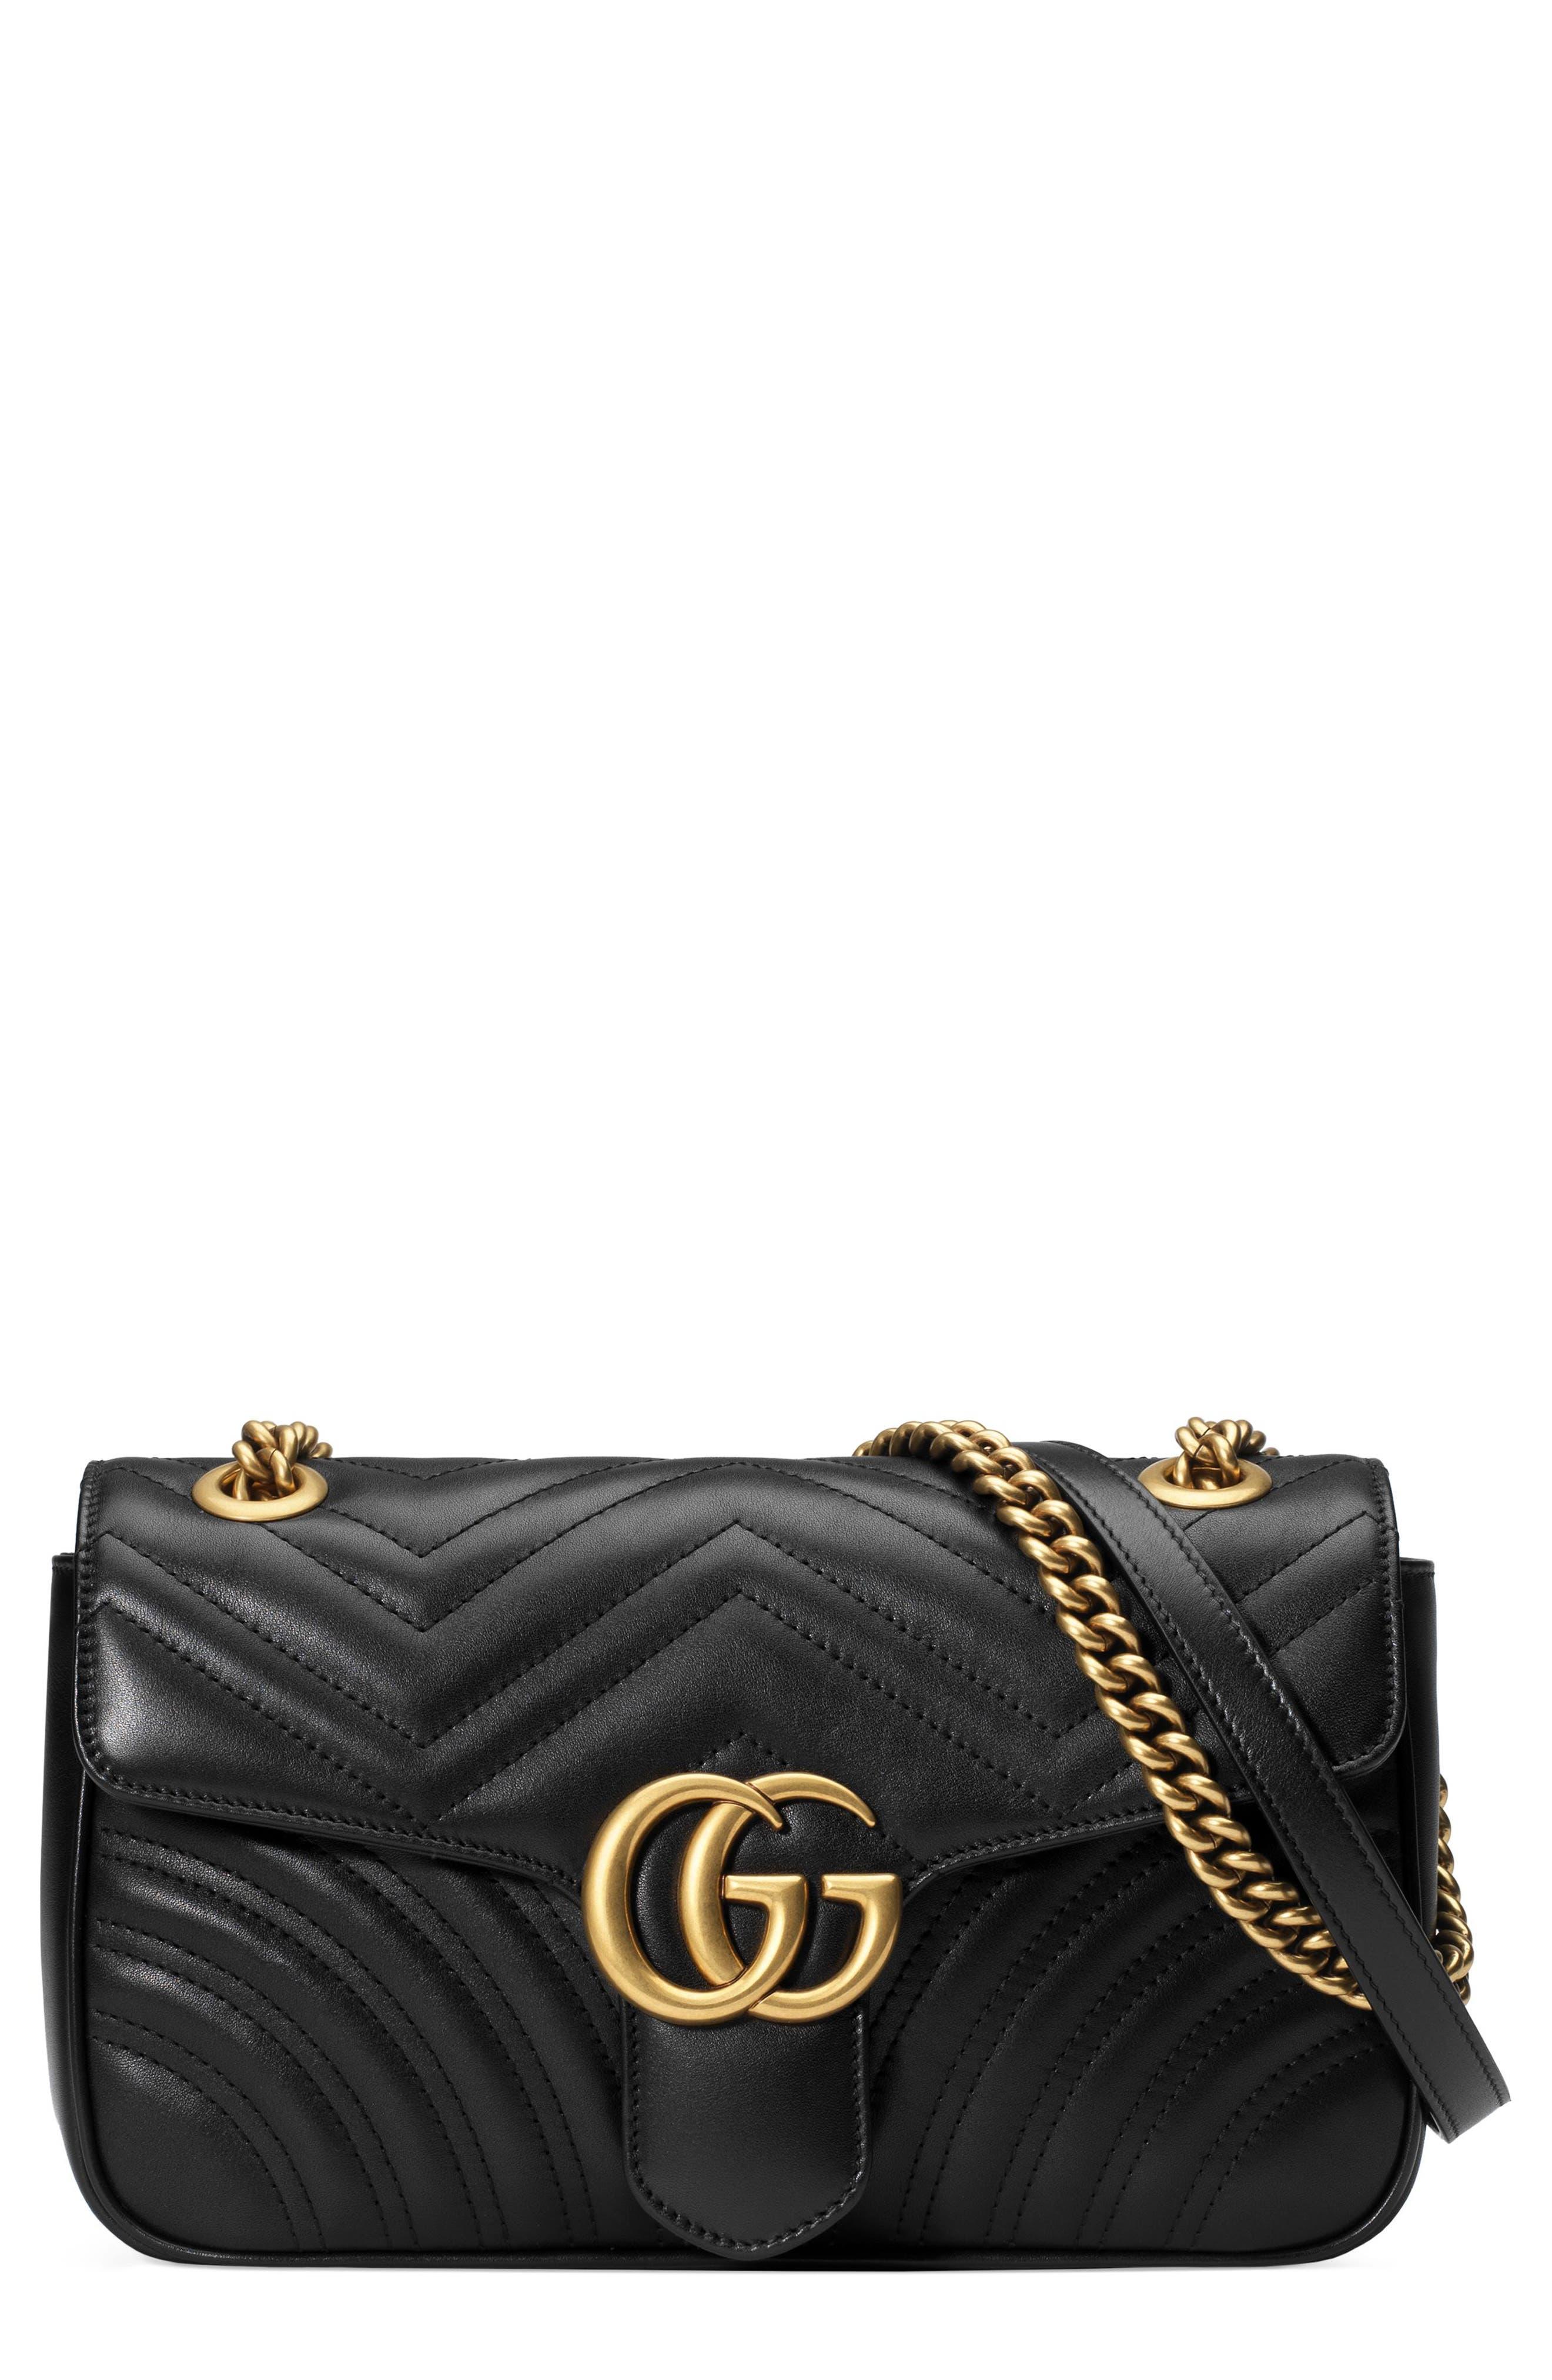 Small GG Marmont 2.0 Matelassé Leather Shoulder Bag,                         Main,                         color, NERO/ NERO